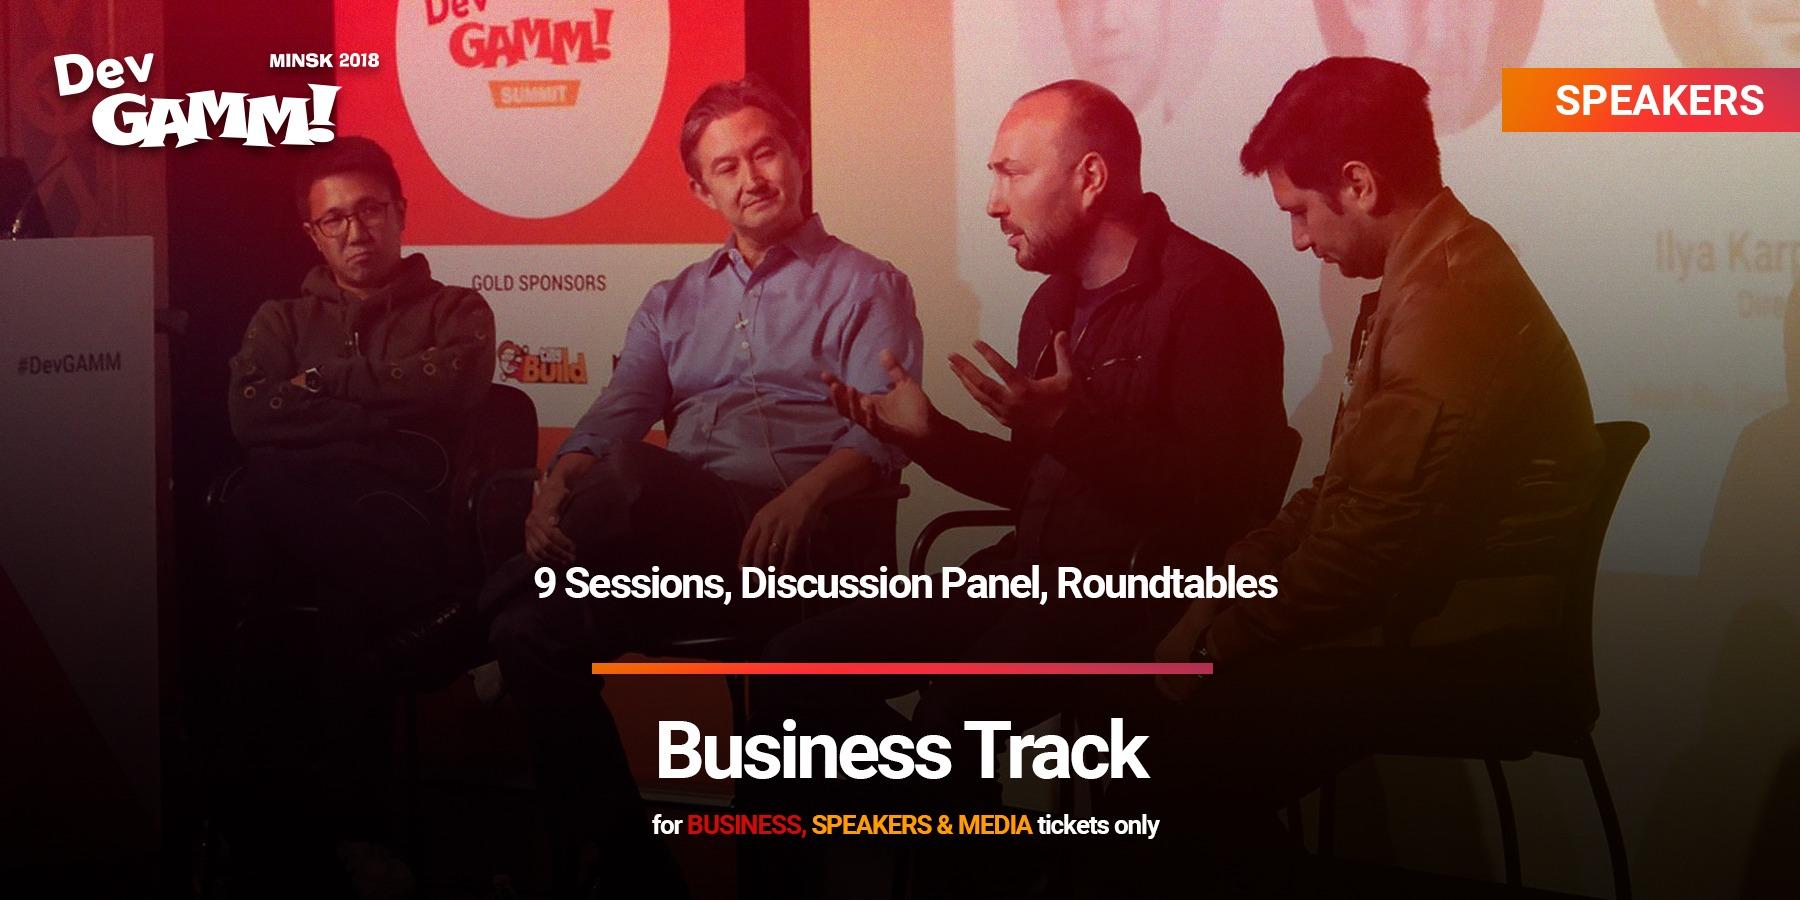 Business Track: Green Hall, November 15-16